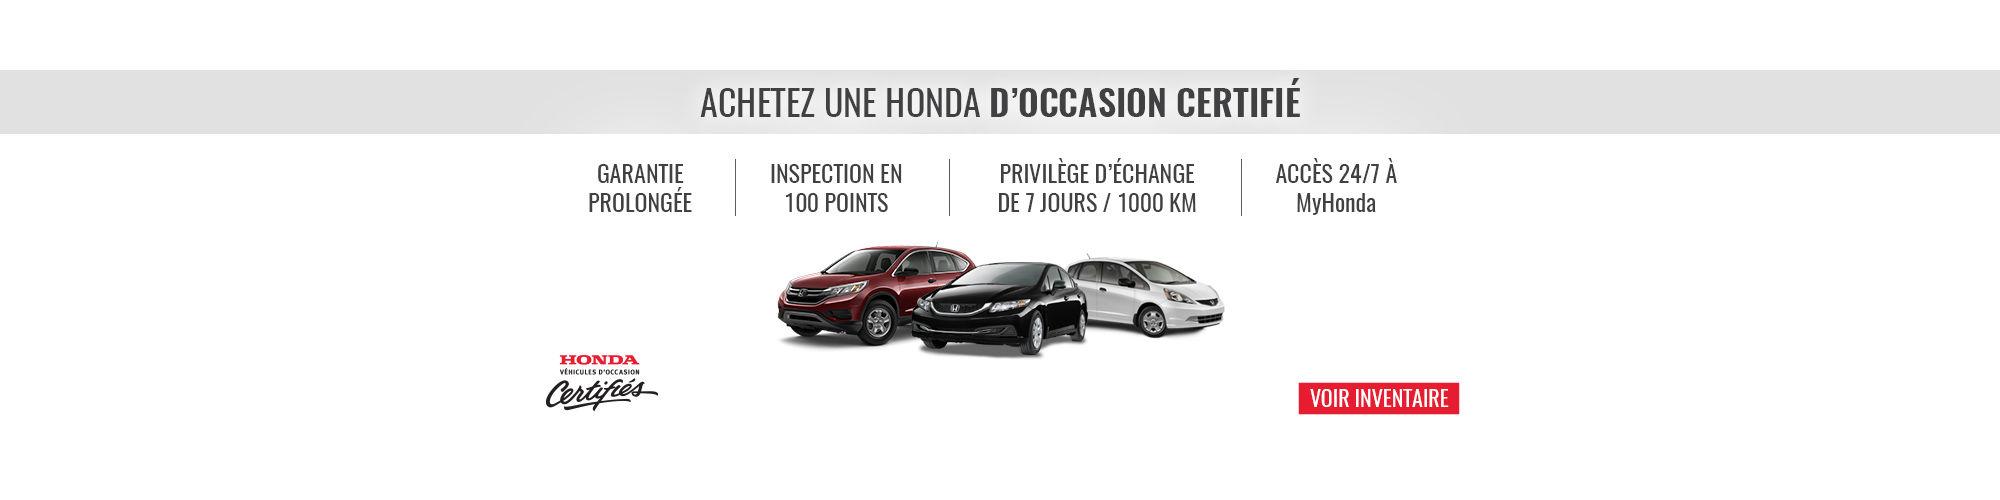 Véhicule d'occasion certifié Honda